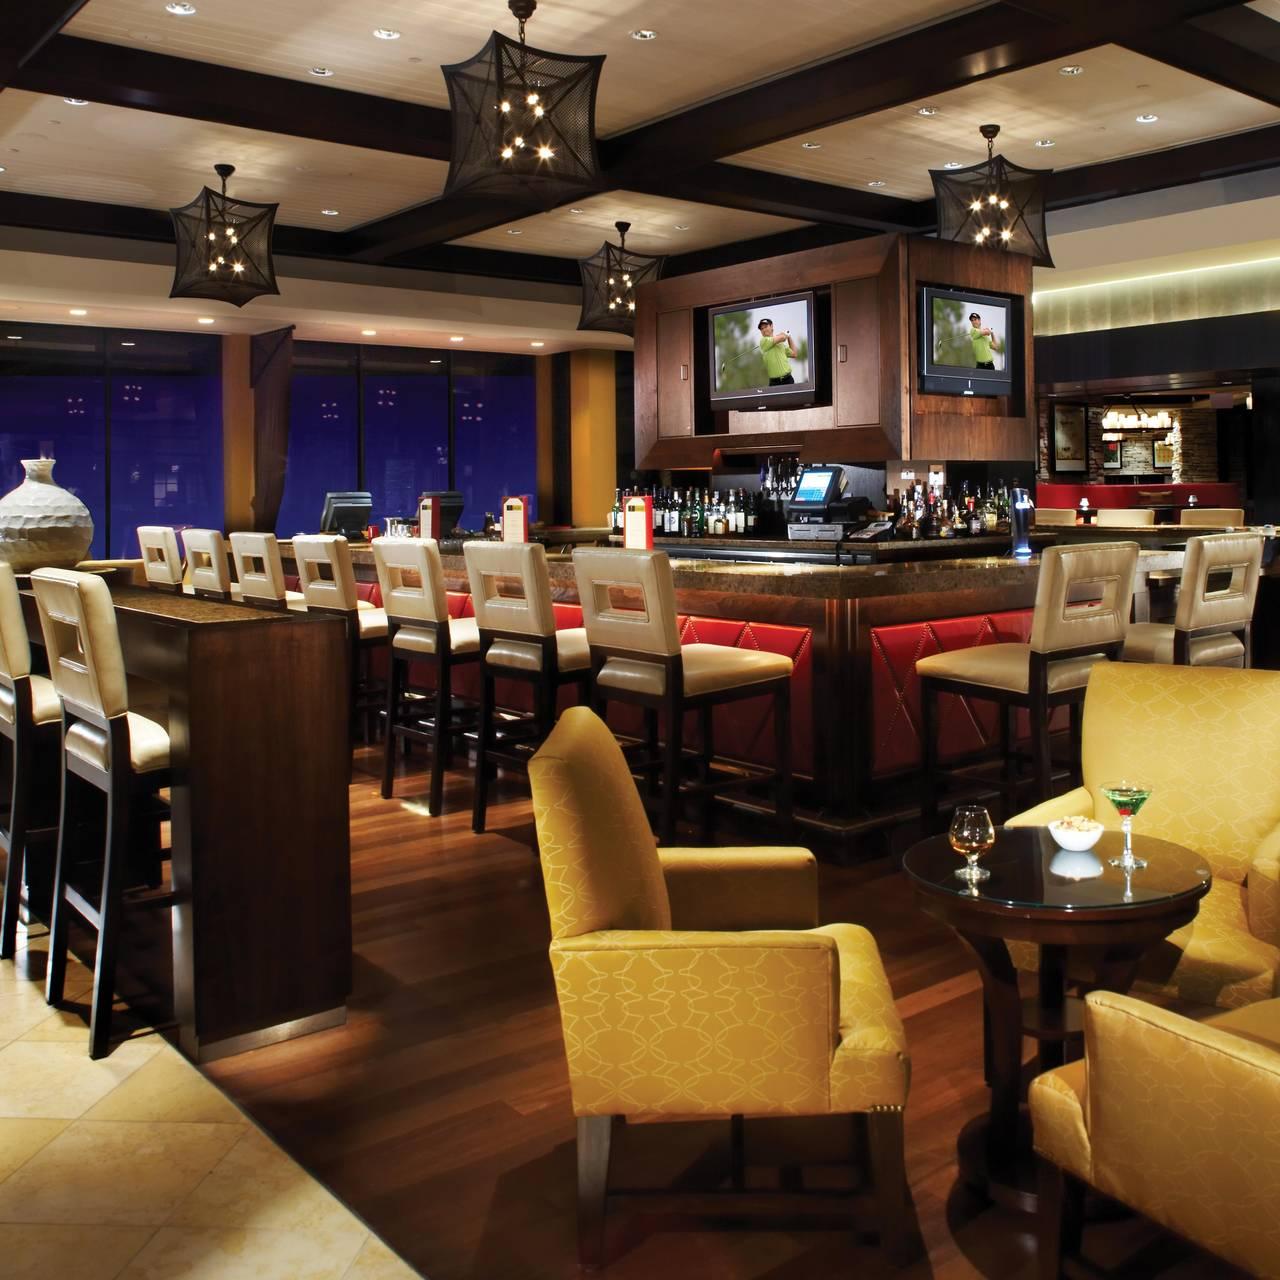 Ironwood Steak & Seafood at The PGA National Resort & Spa Restaurant ...